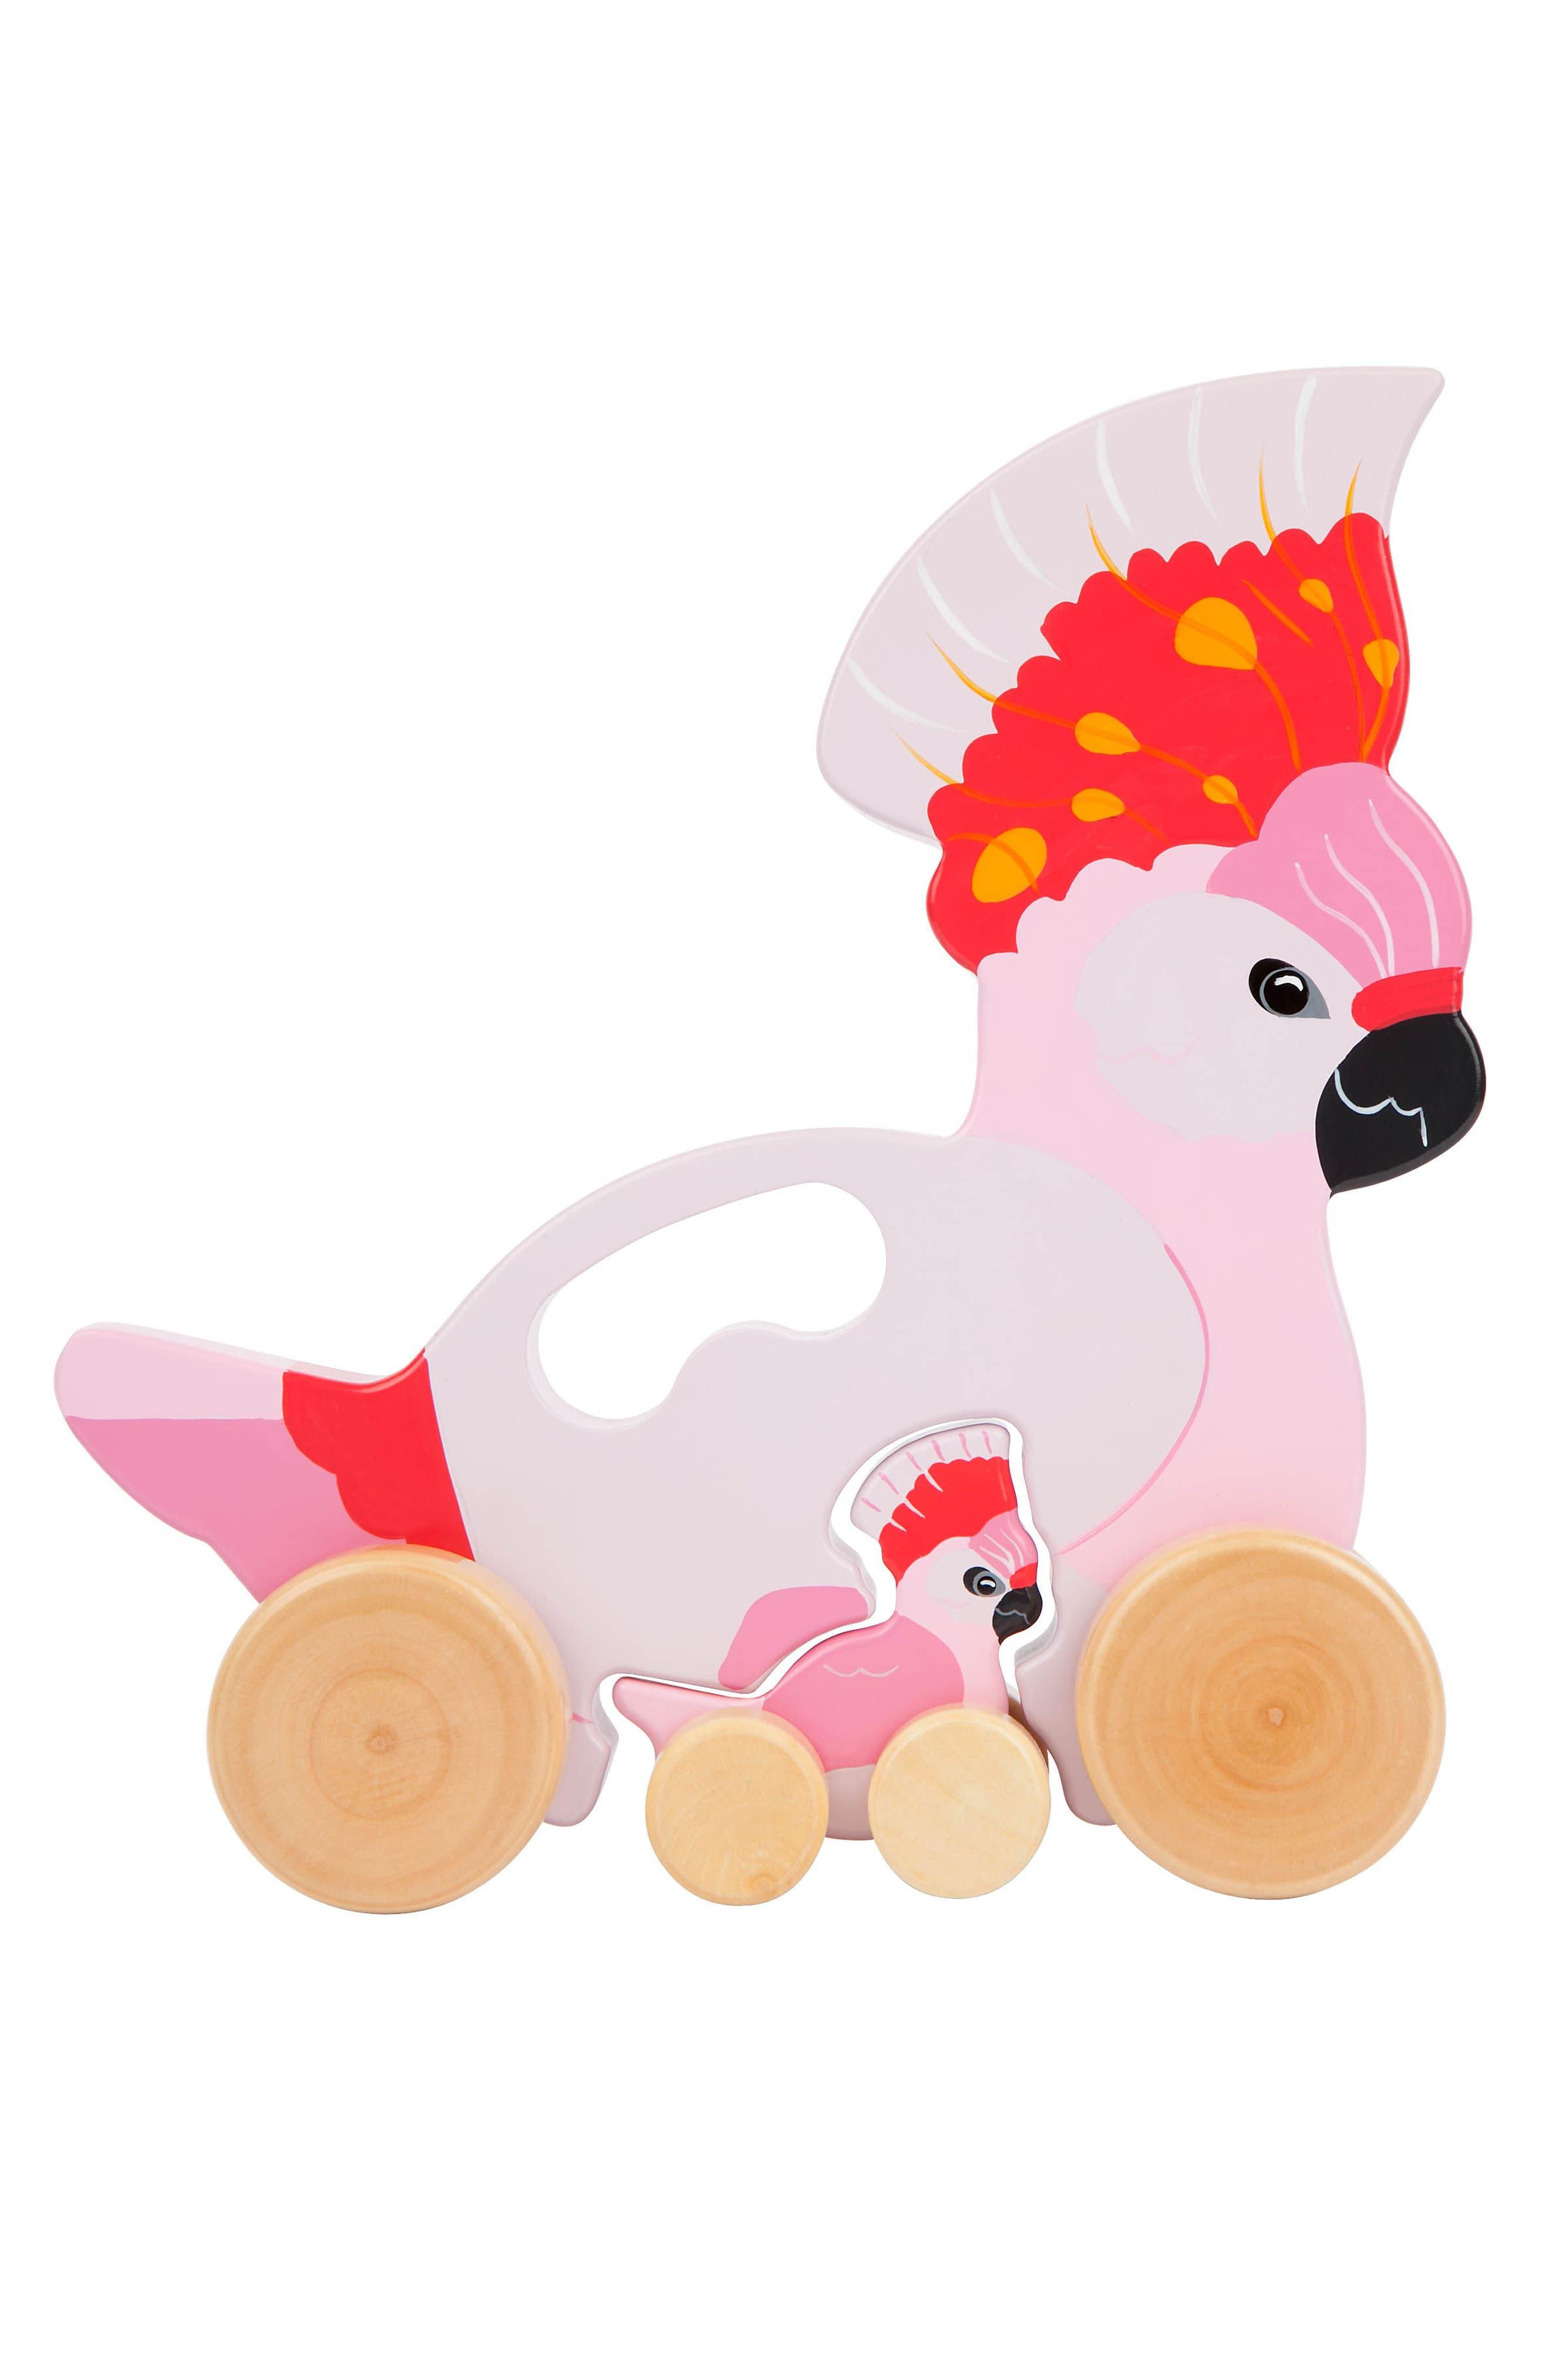 Set of 2 Medium Wheeled Nesting Birds Wooden Toys,                             Main thumbnail 1, color,                             Pink